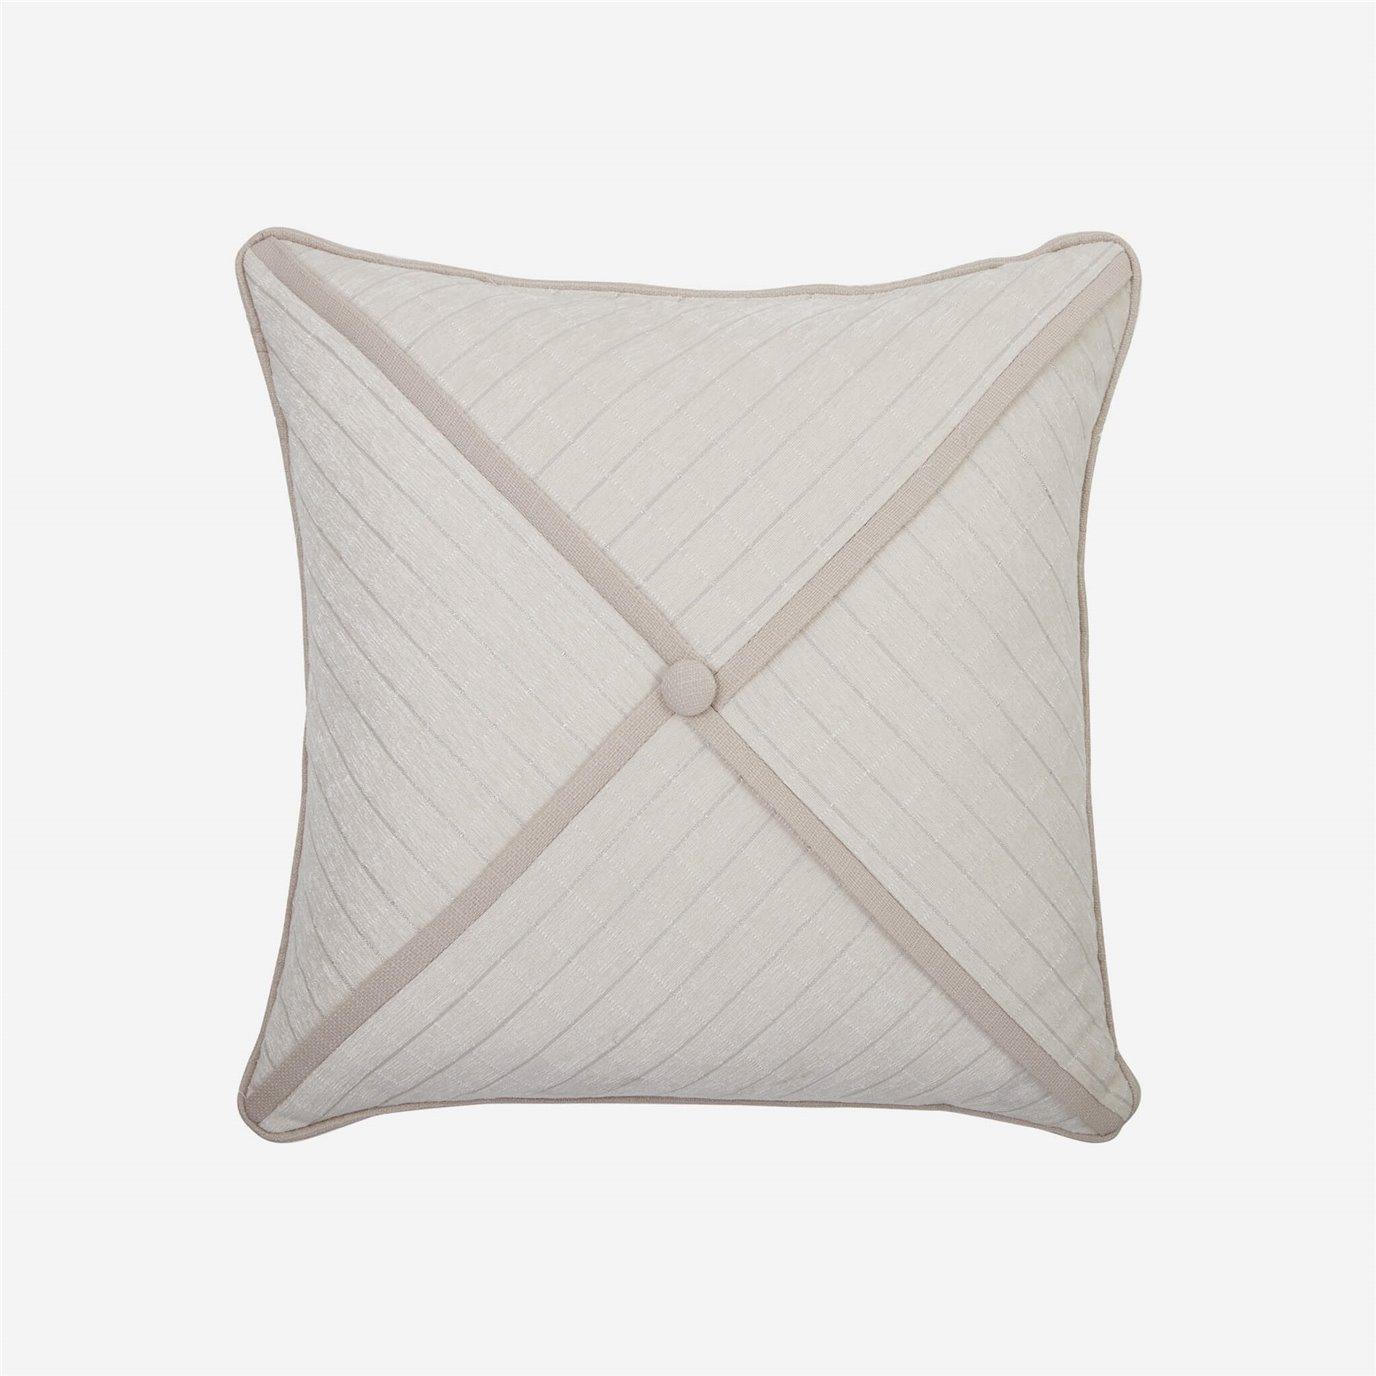 Croscill Bela Fashion Pillow 18x18